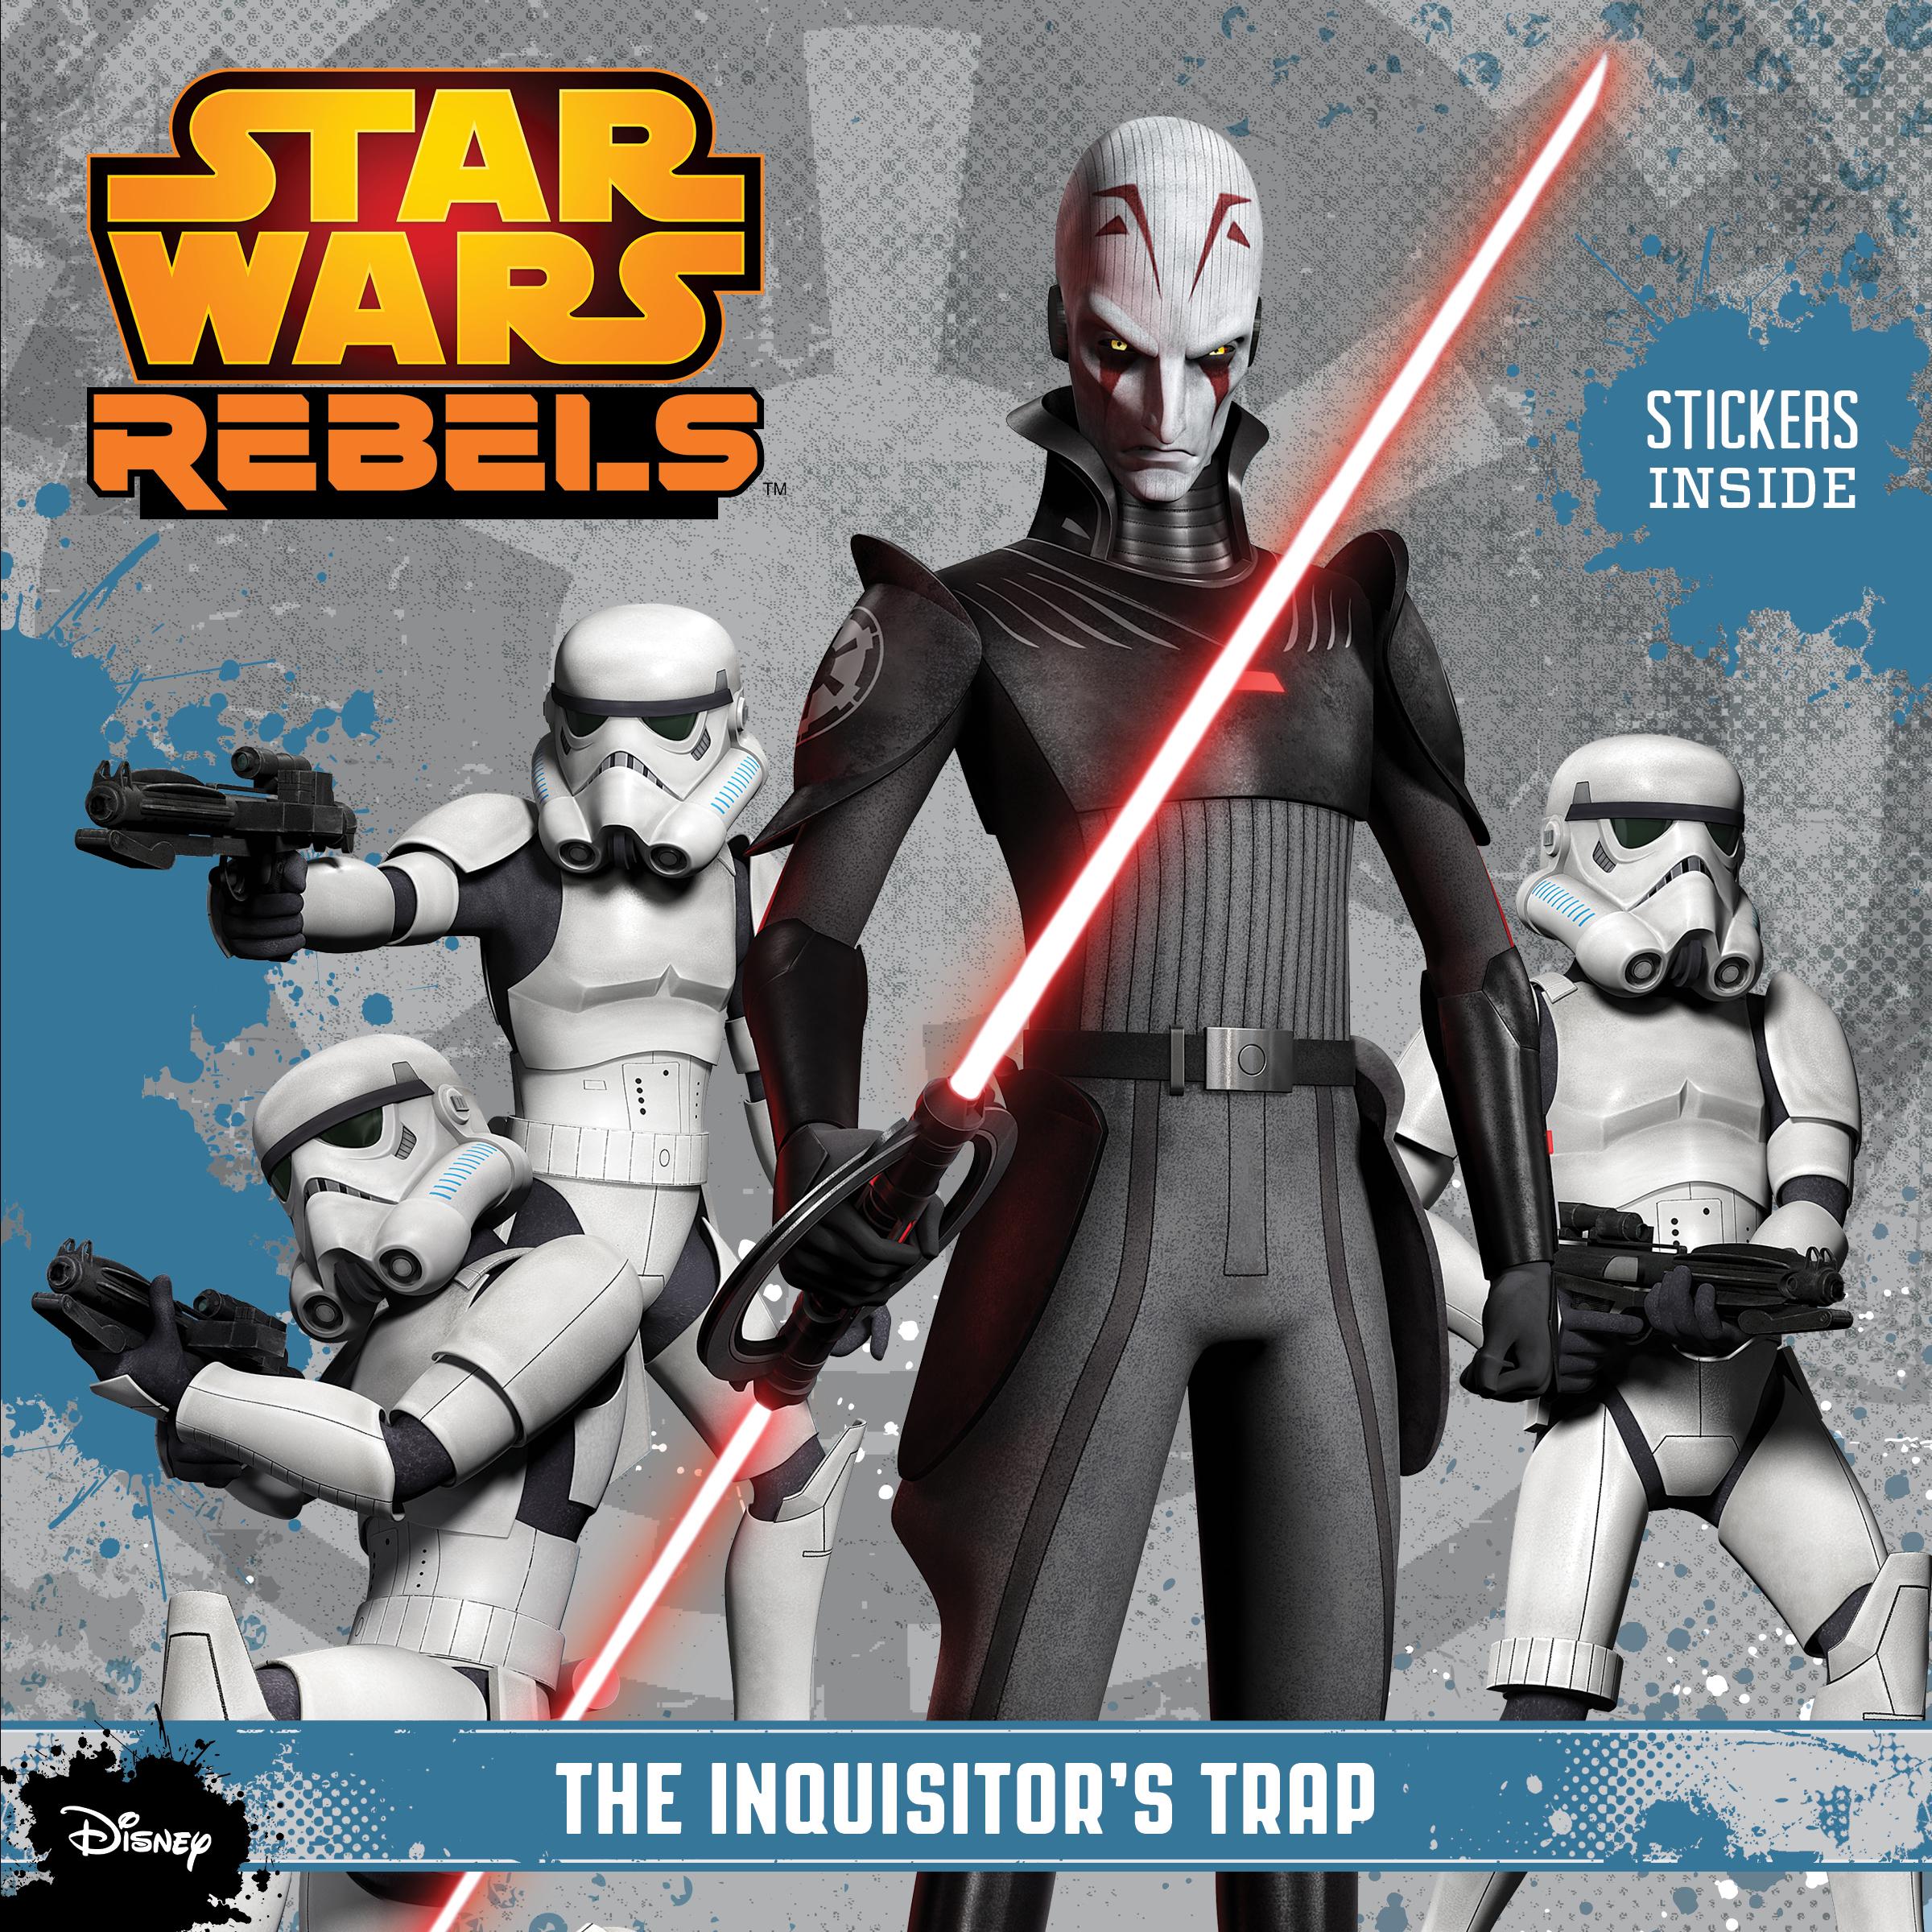 The Inquisitor's Trap